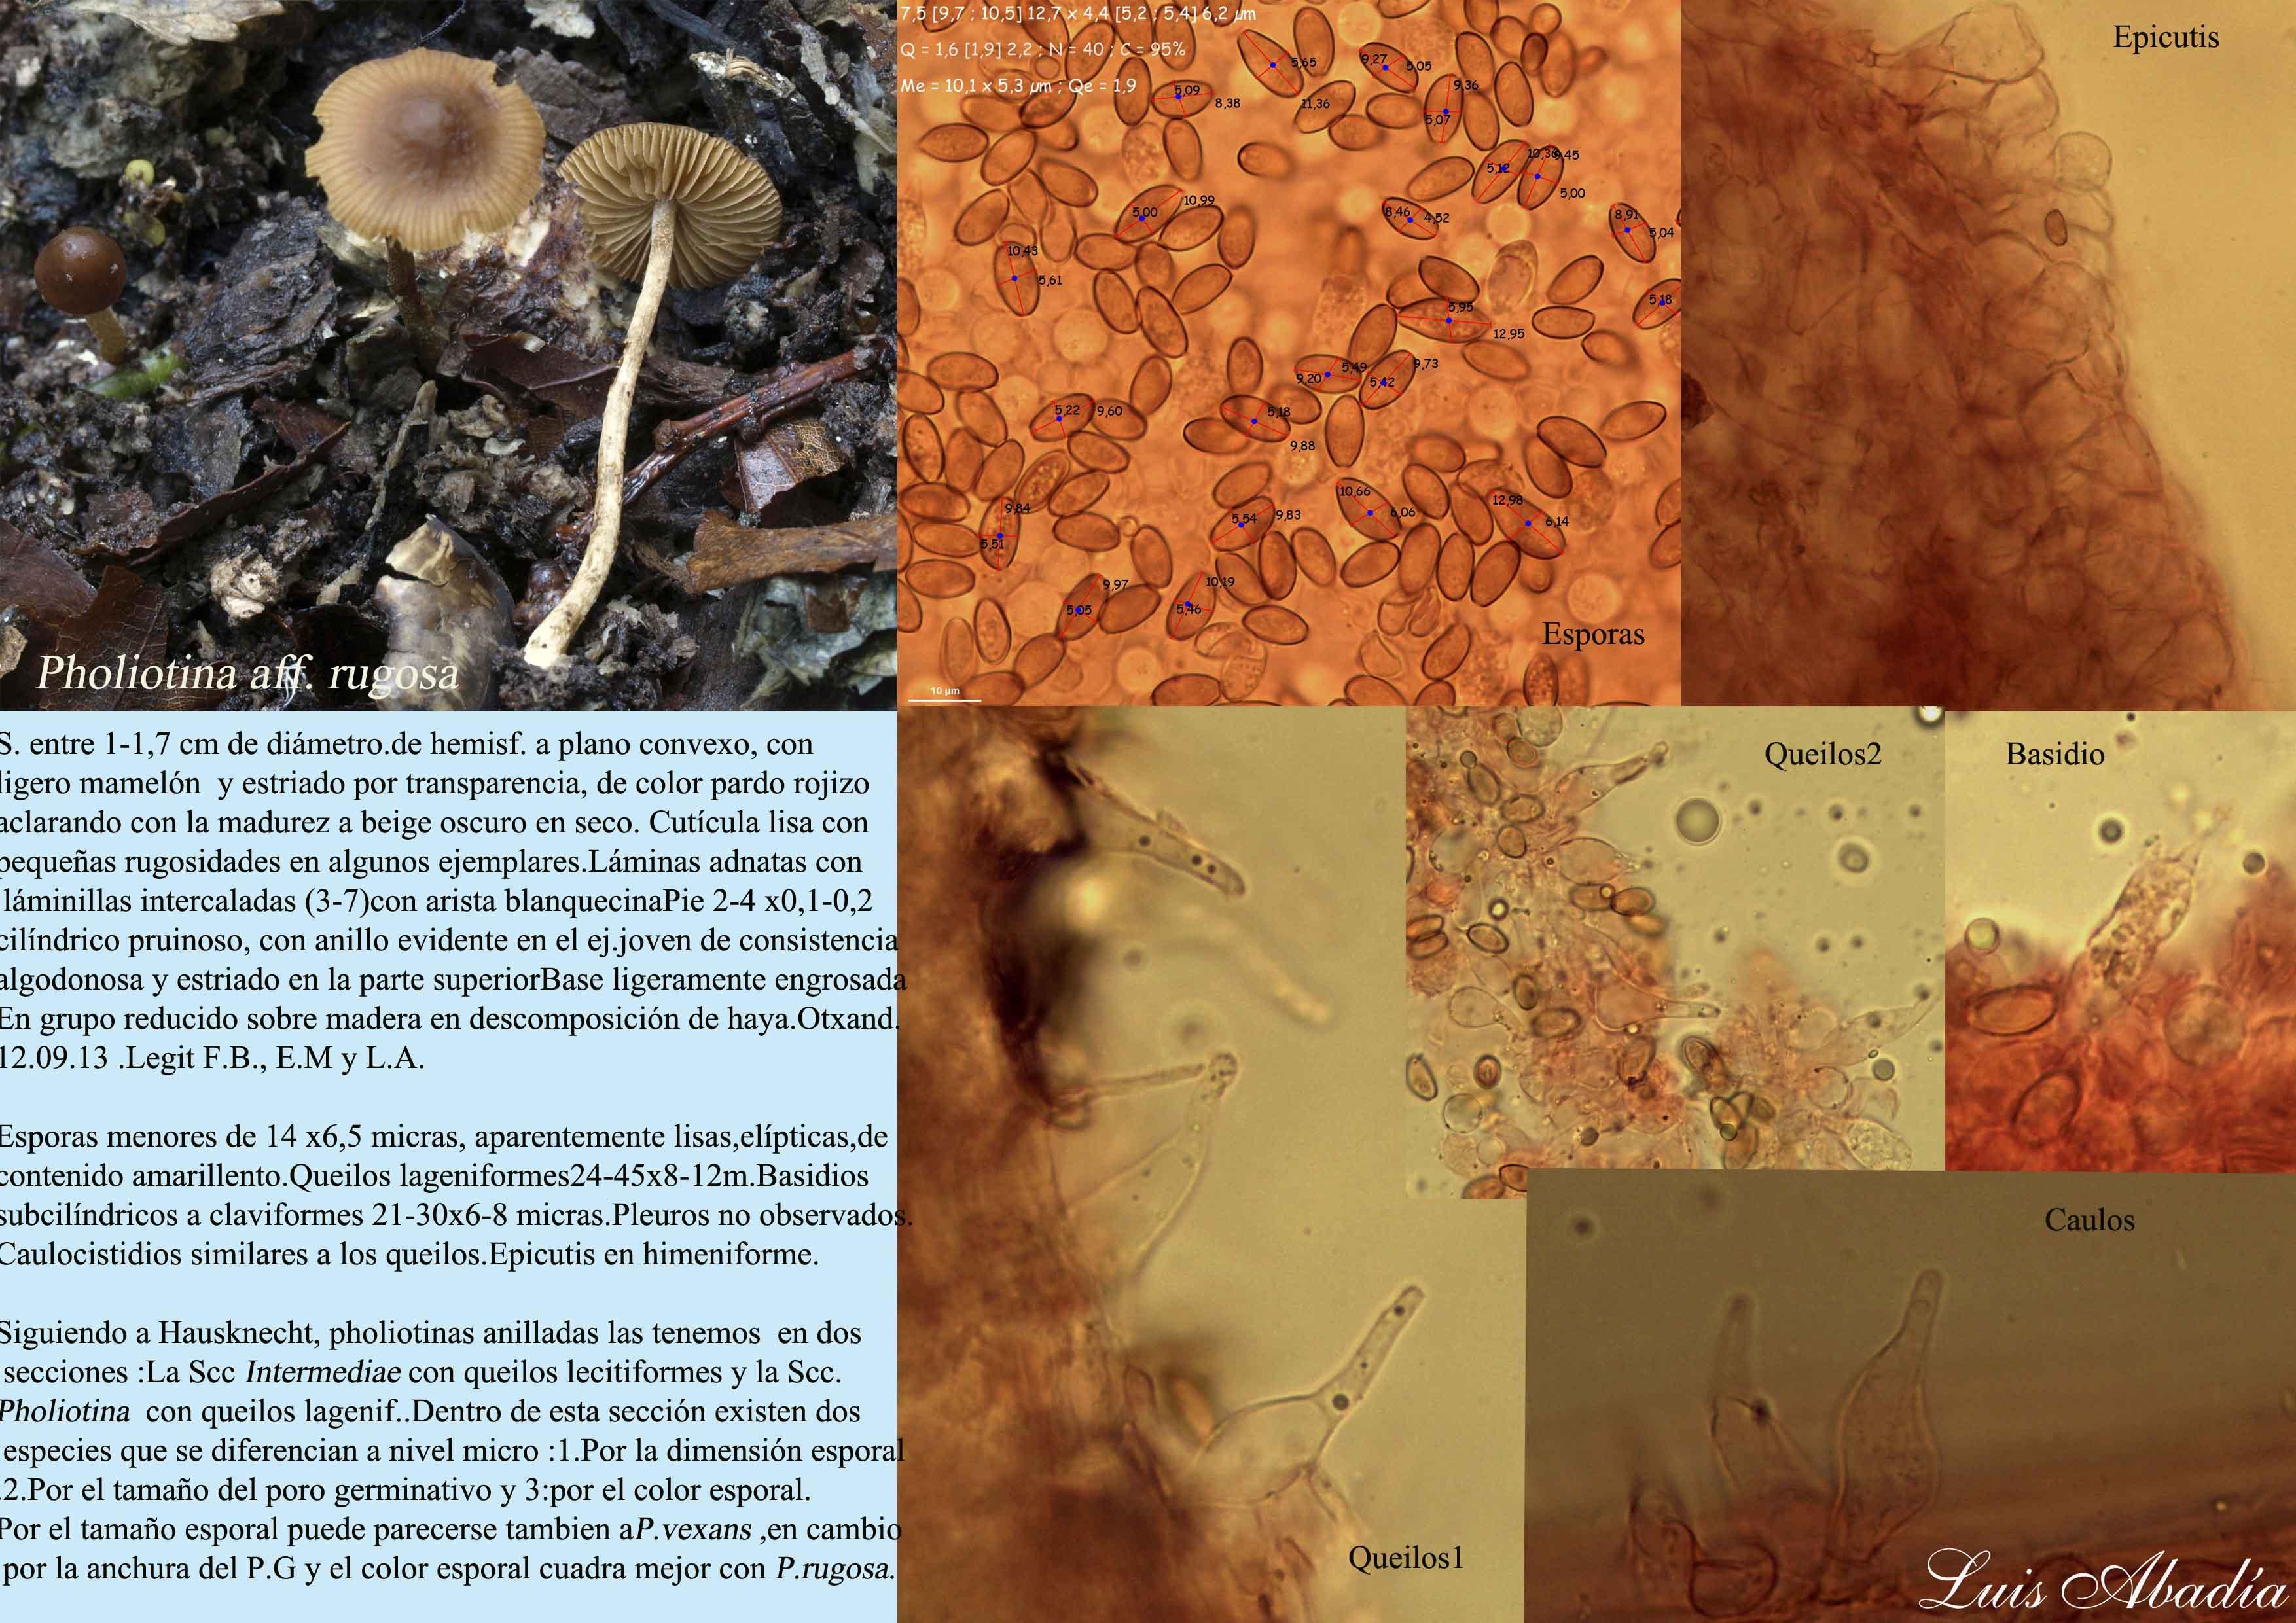 Pholiotina aff rugosa